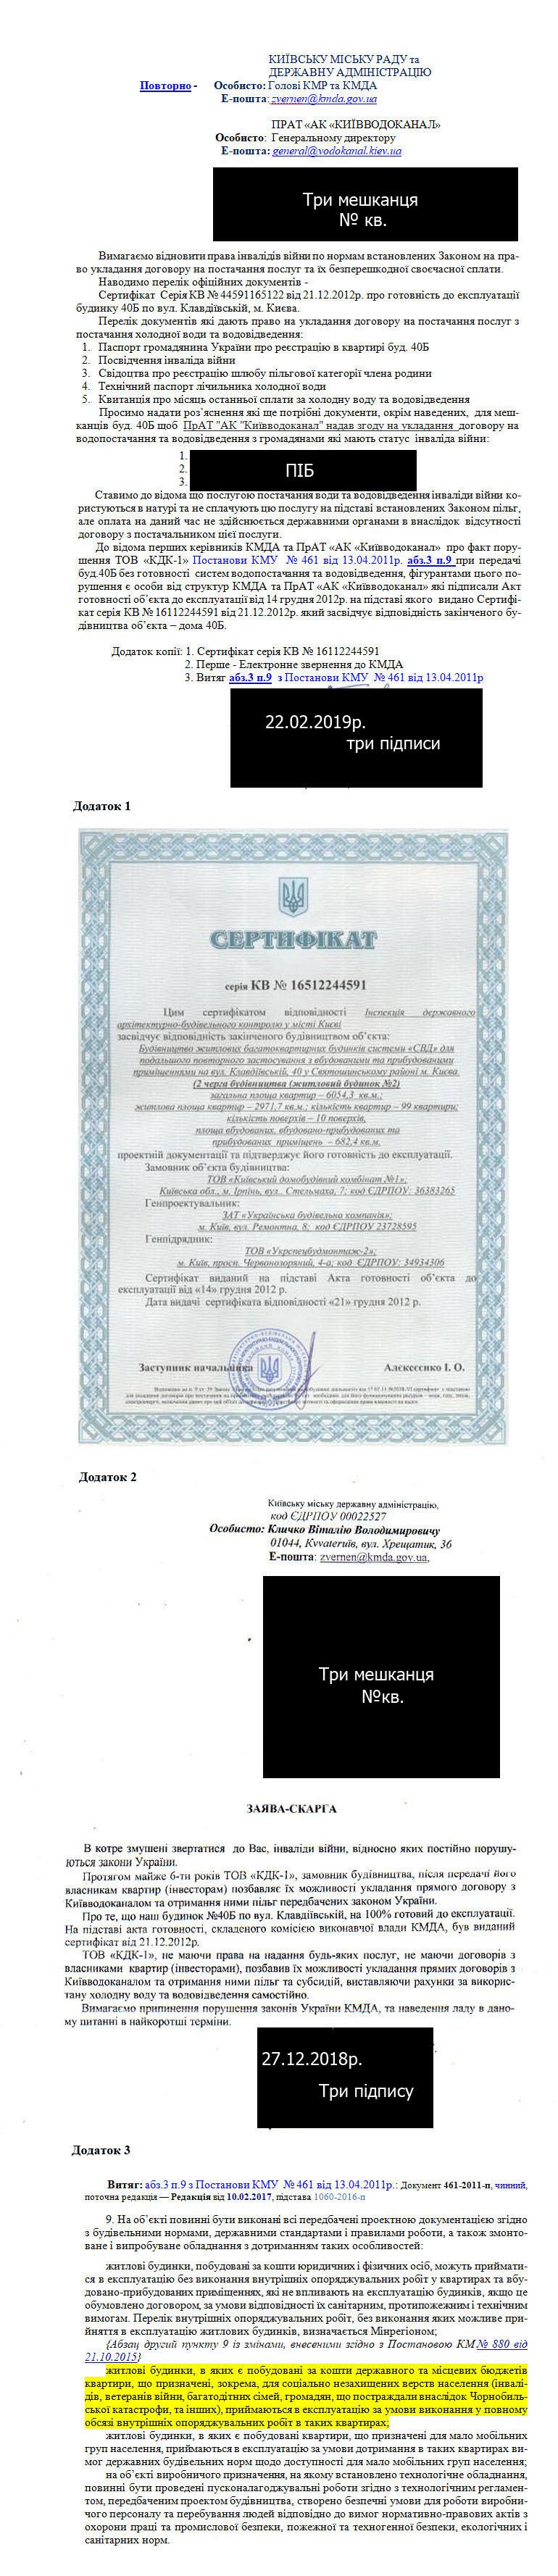 Звер-КМР-КМДА-Водок-k